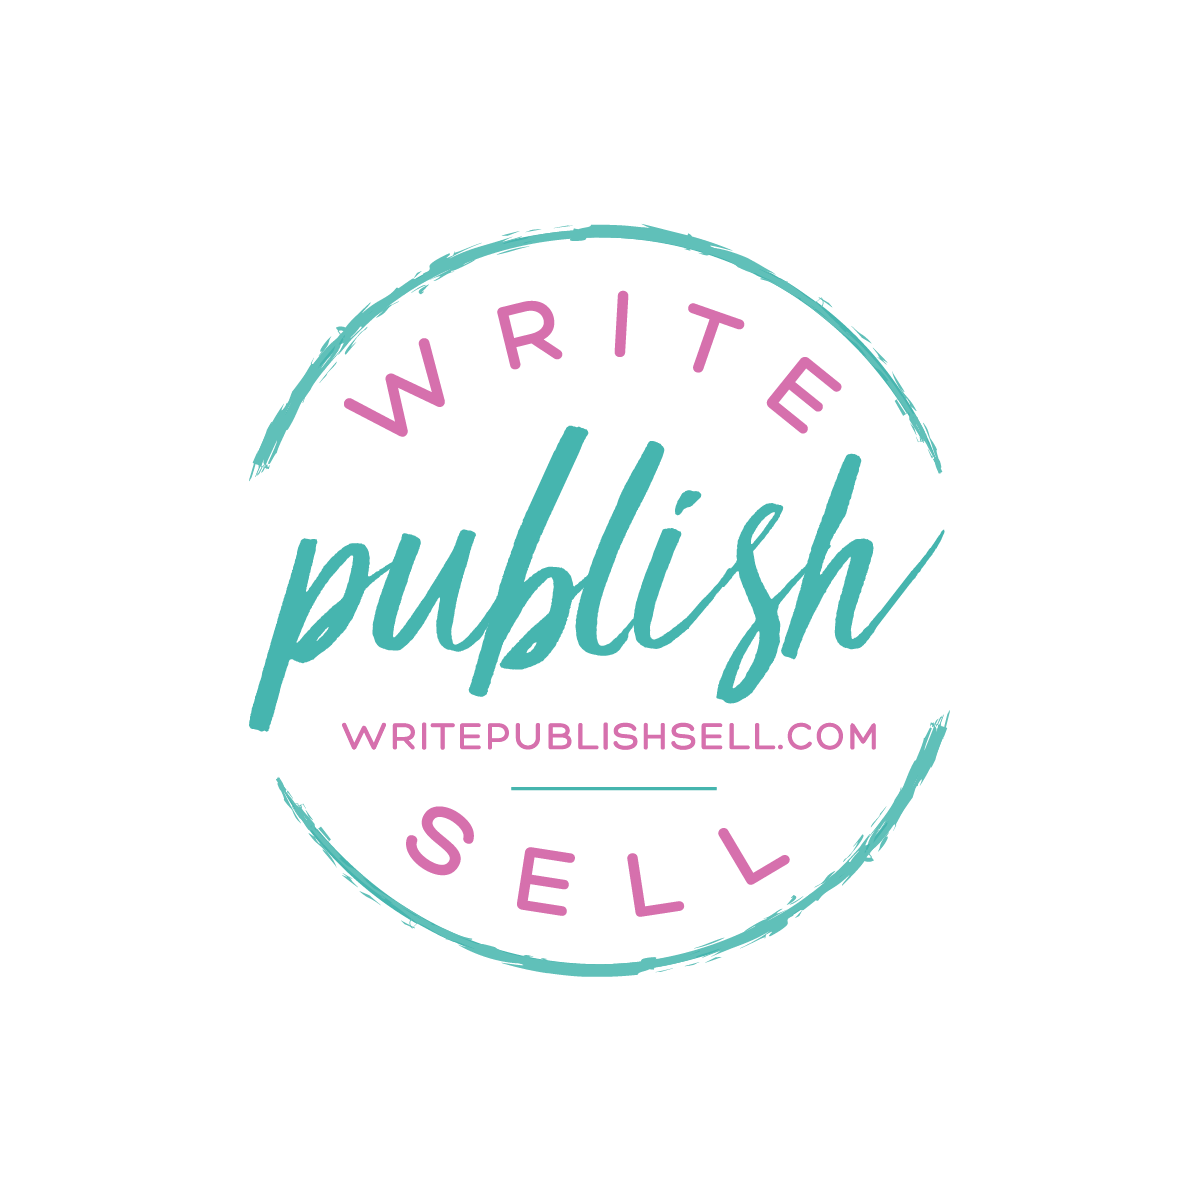 WRITE|PUBLISH|SELL